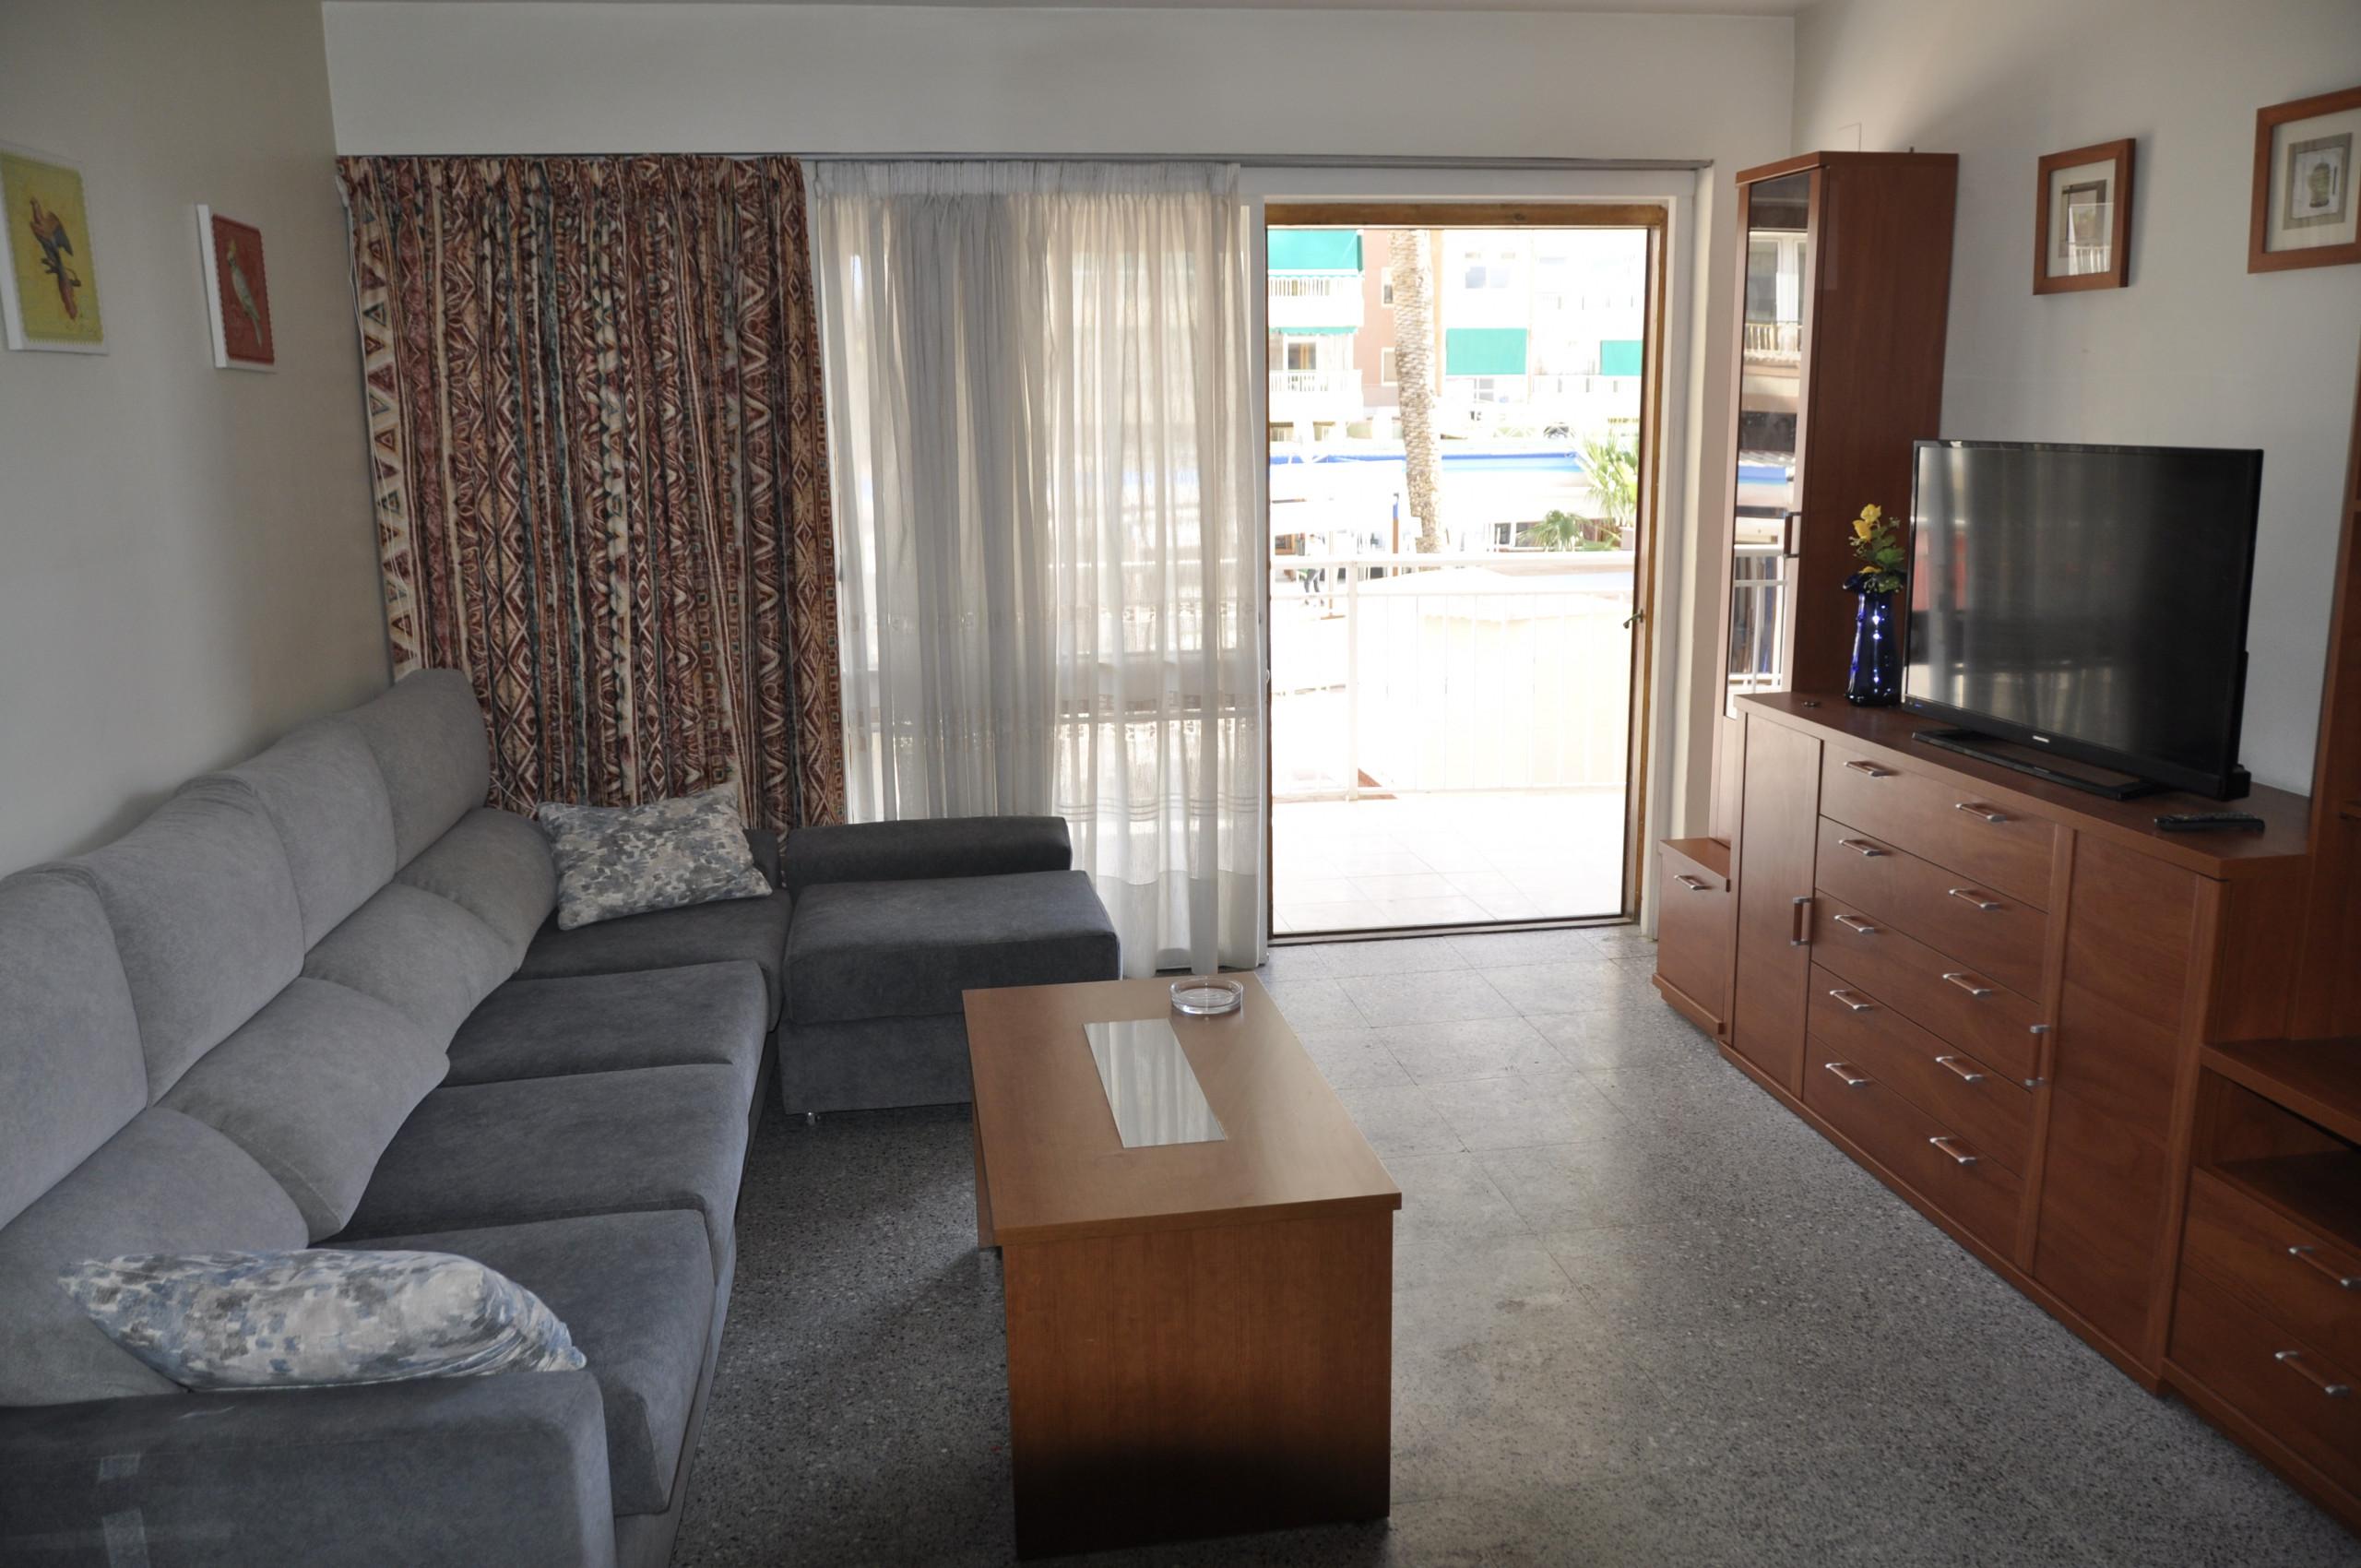 R541 BENIDORM LEVANTE BEACH VIEWS - Apartments in Benidorm